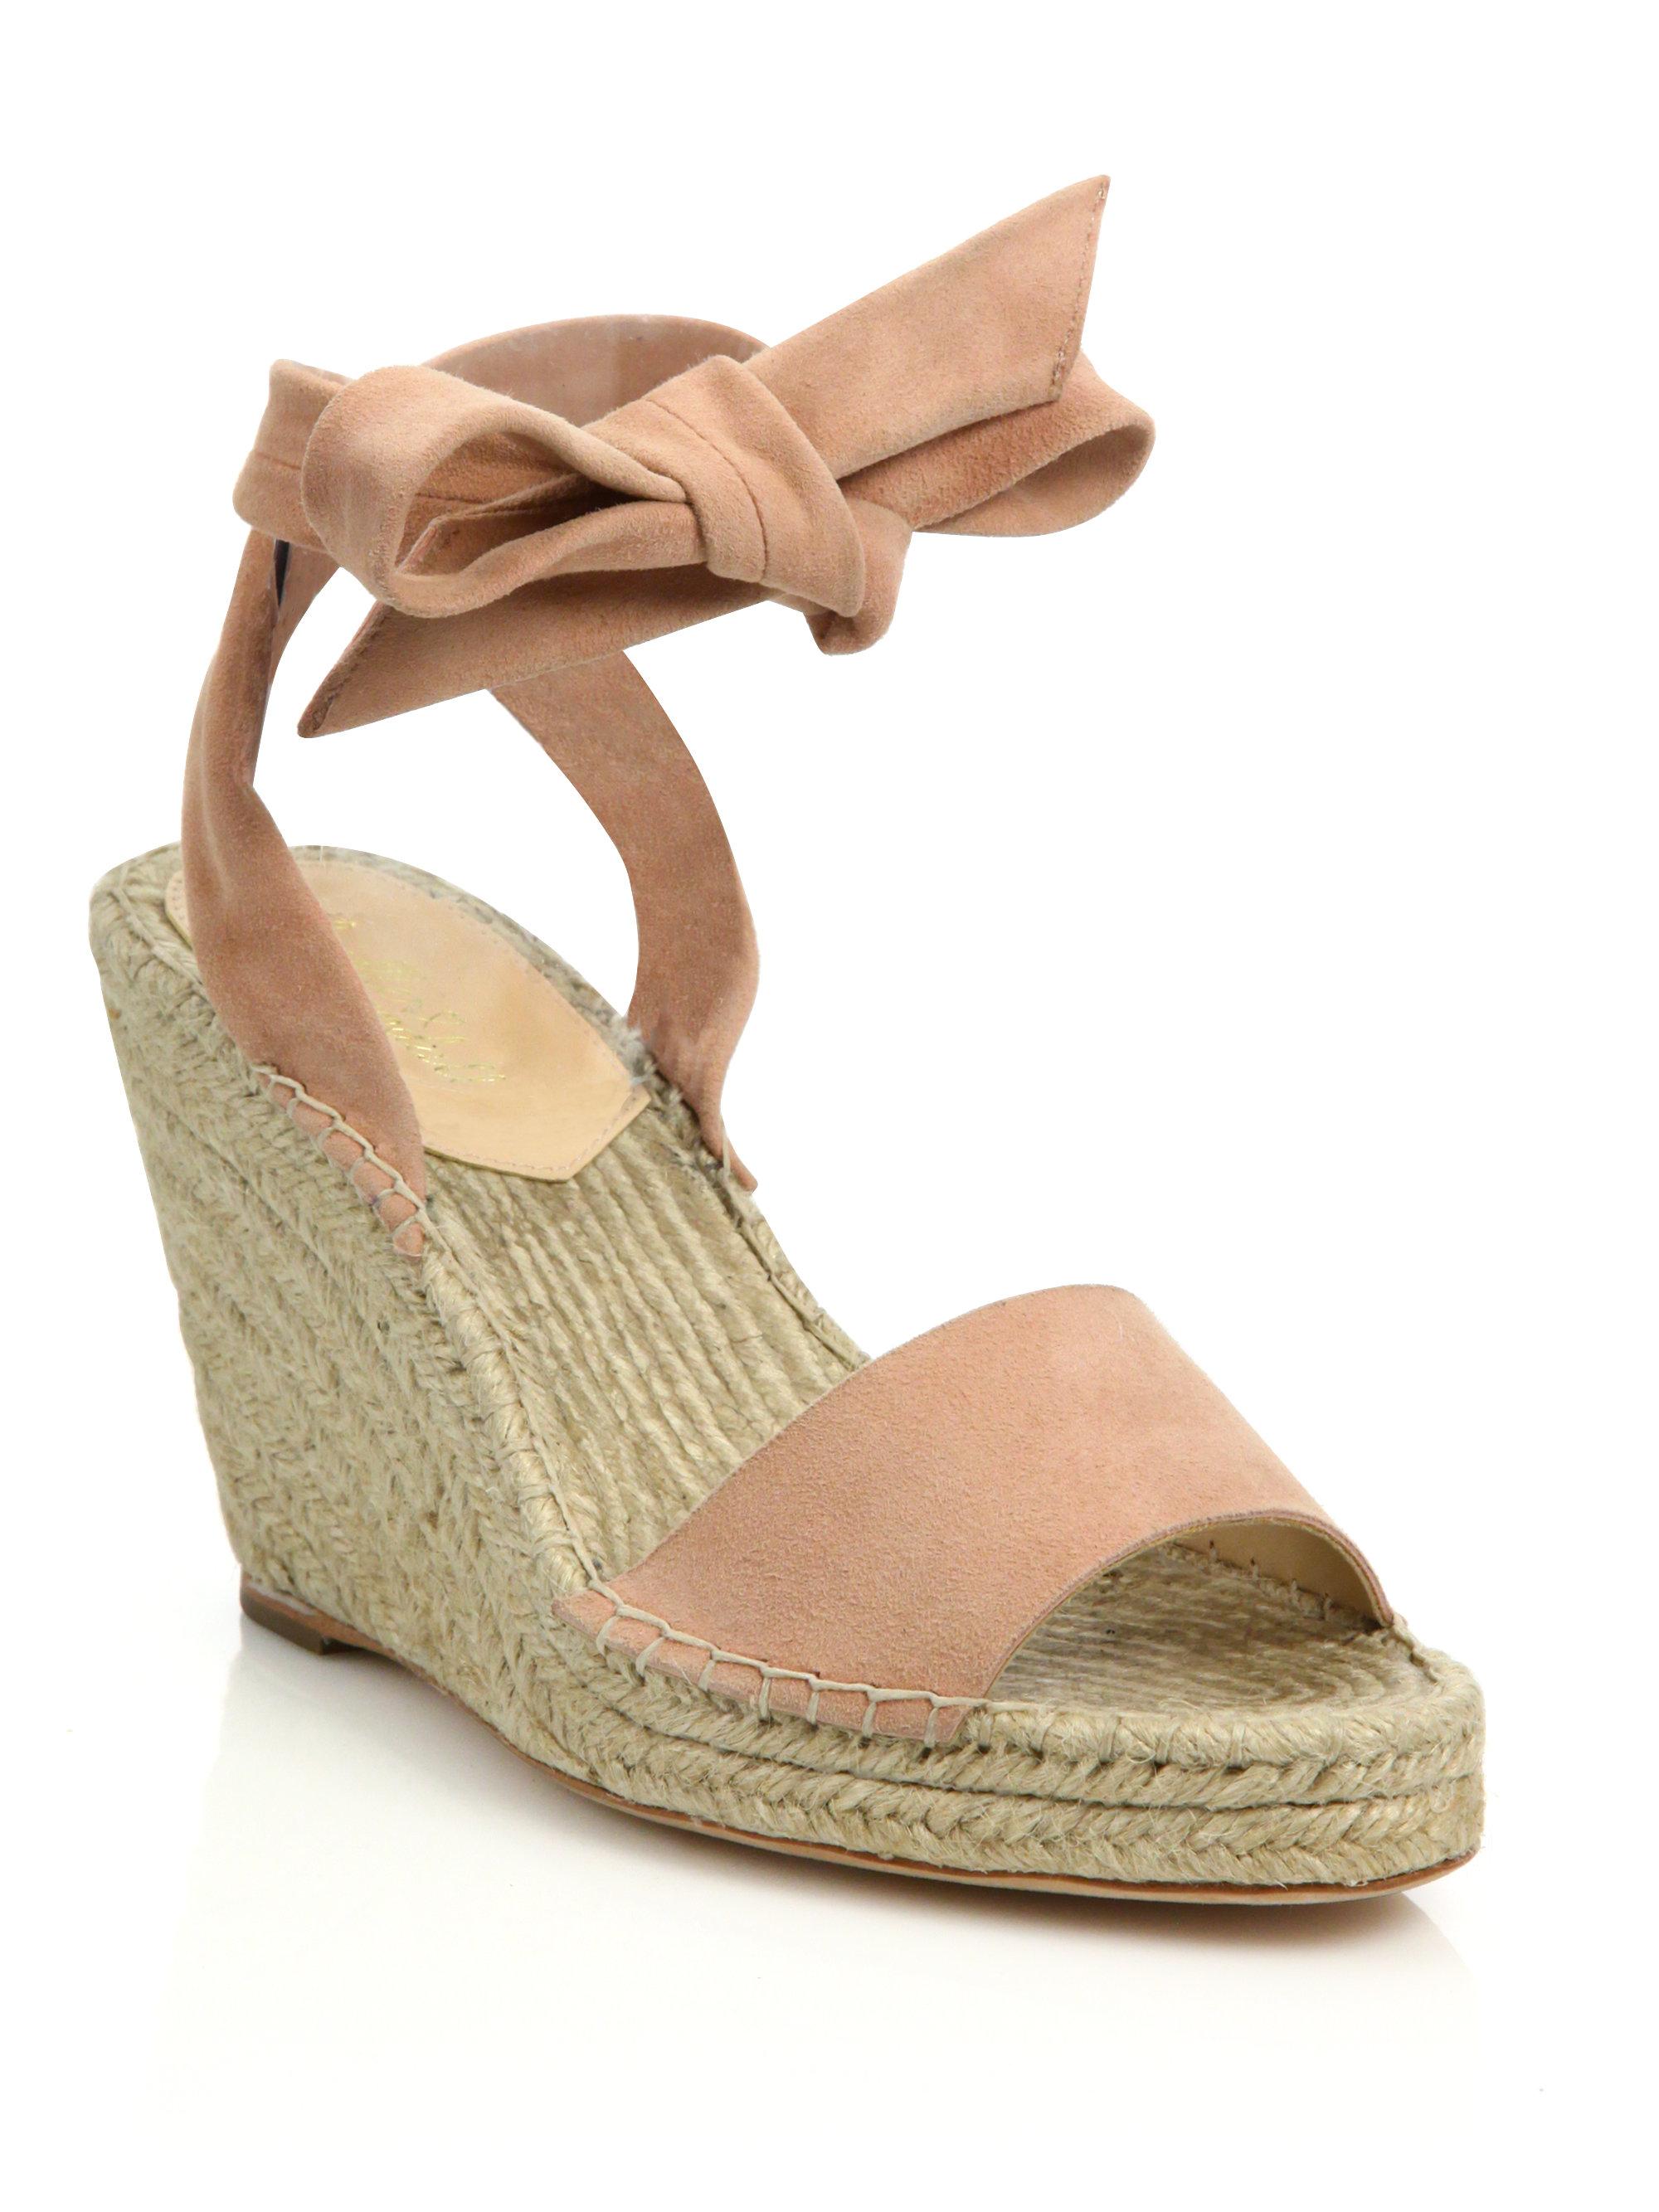 893e63ef42a Lyst - Loeffler Randall Harper Suede Espadrille Wedge Sandals in Pink